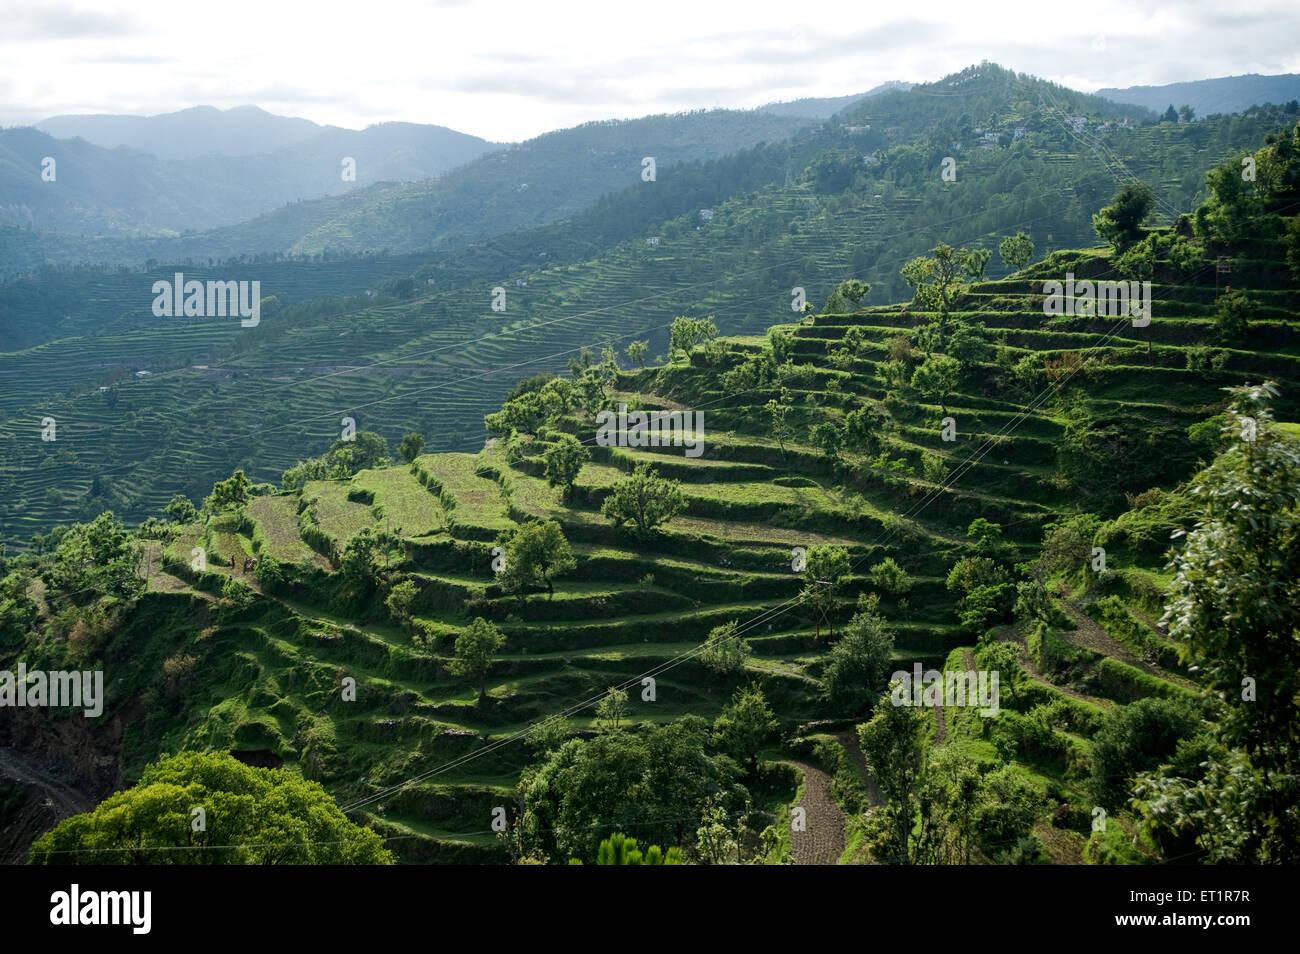 Los Cultivos En Terrazas En Uttarakhand India Asia Foto